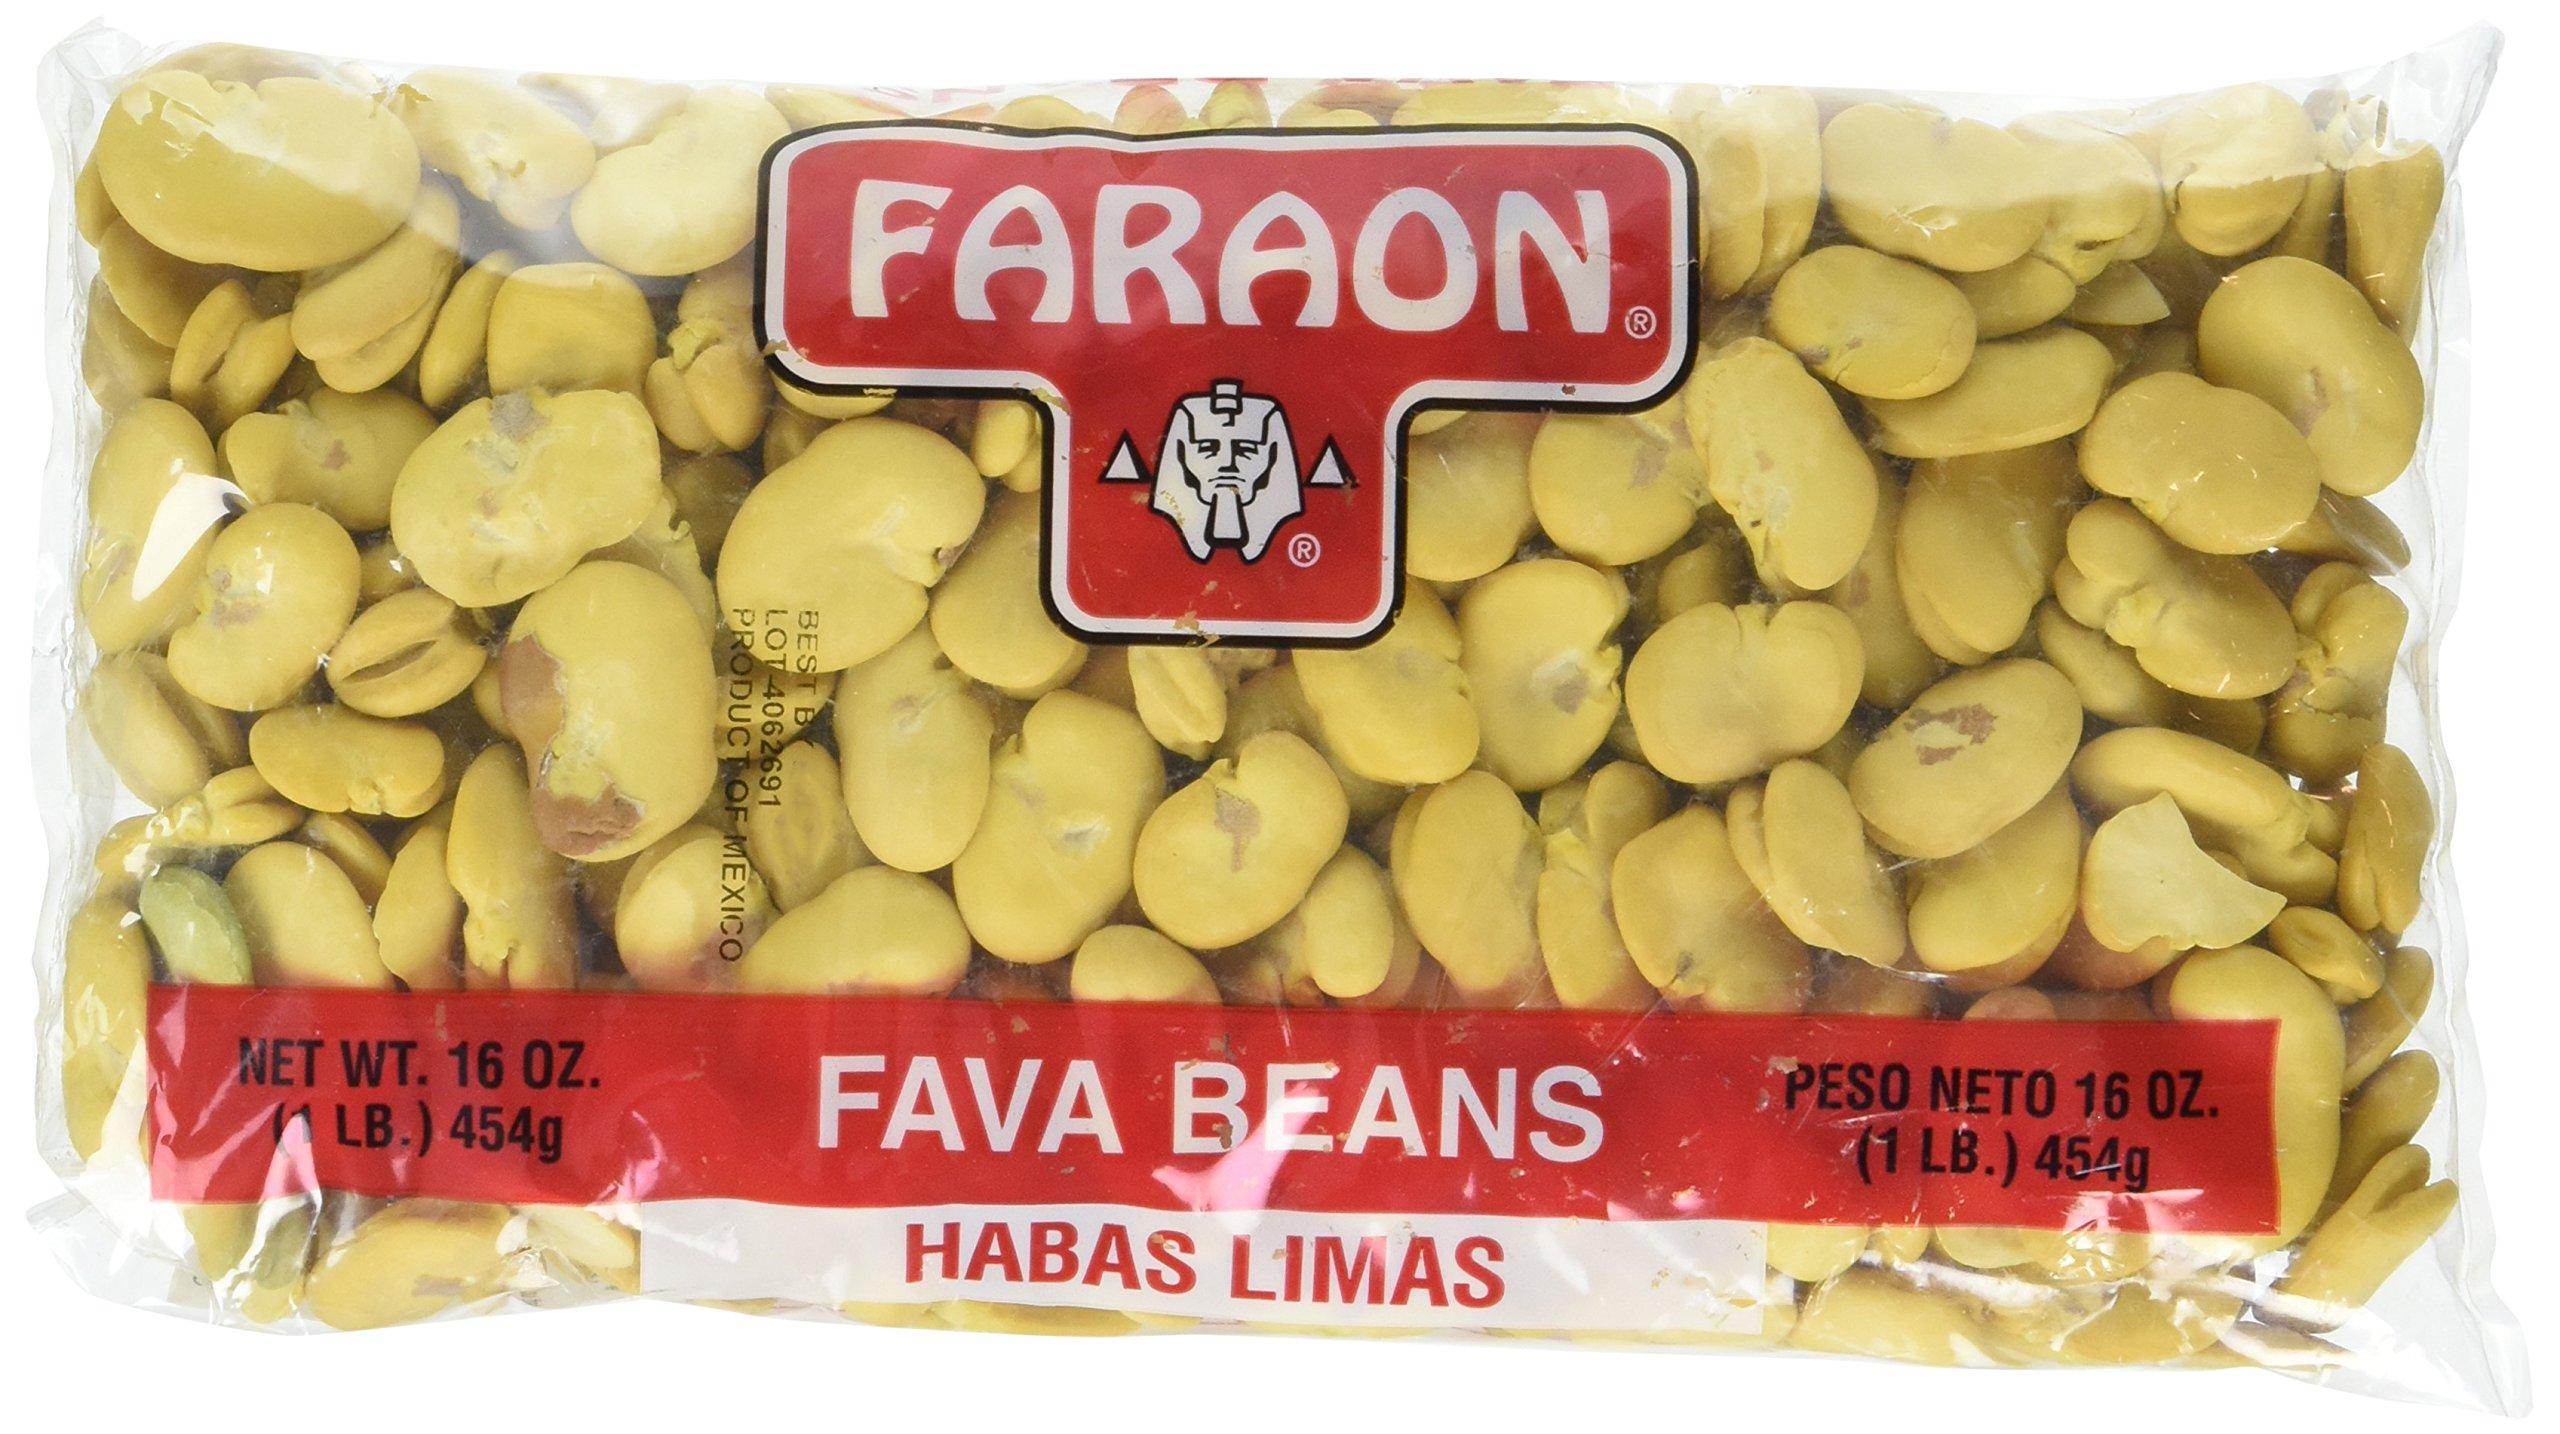 FARAON Habas, 1 Pound